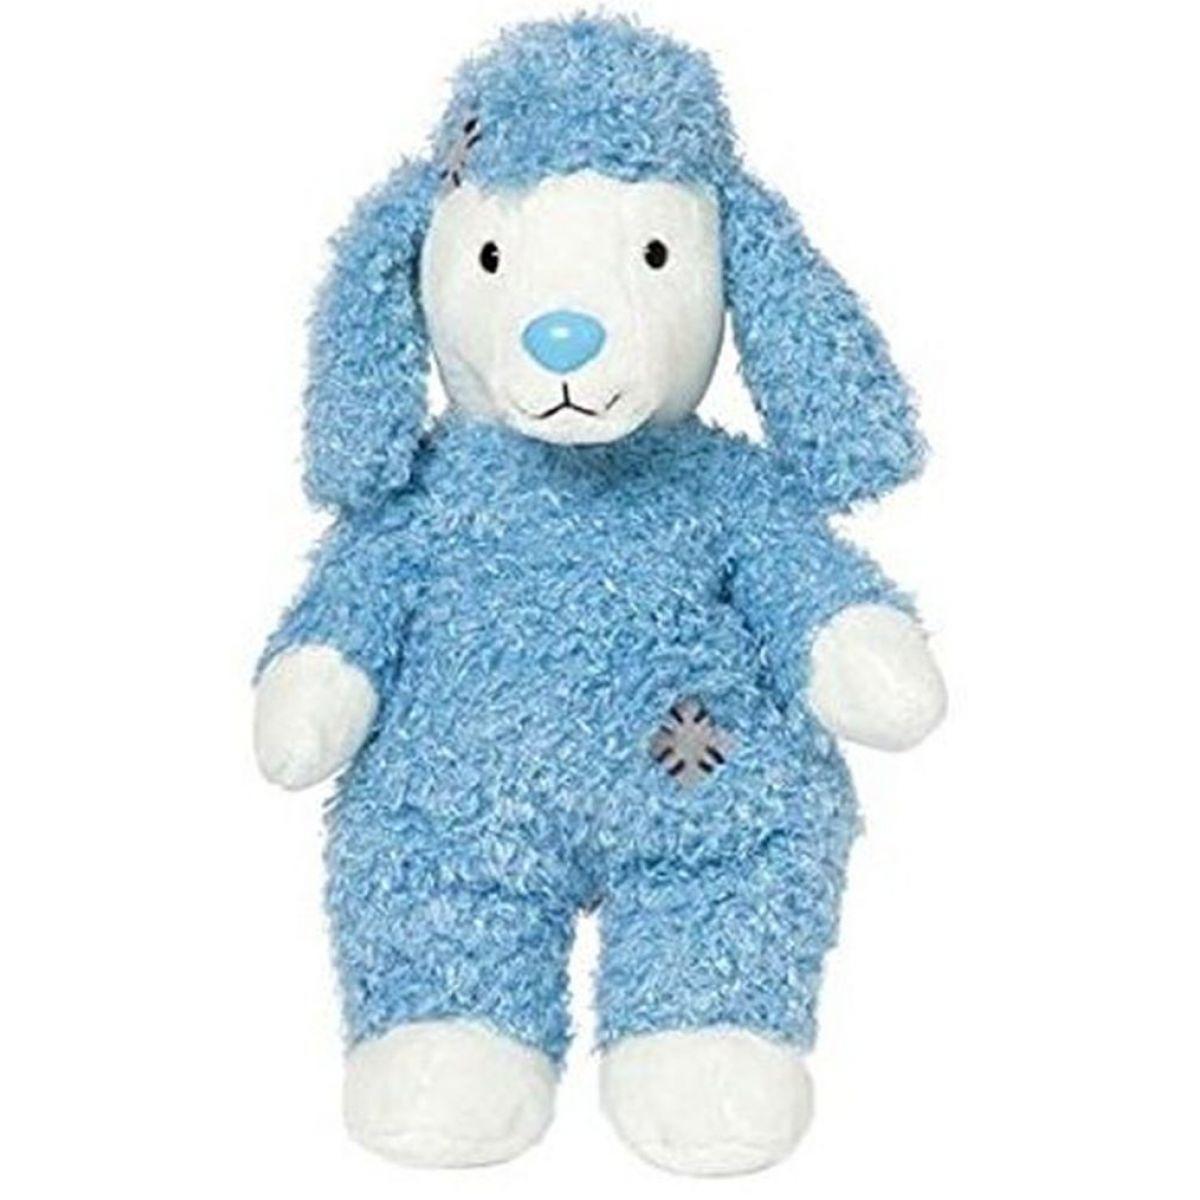 My blue nose friends Floppy Pudl